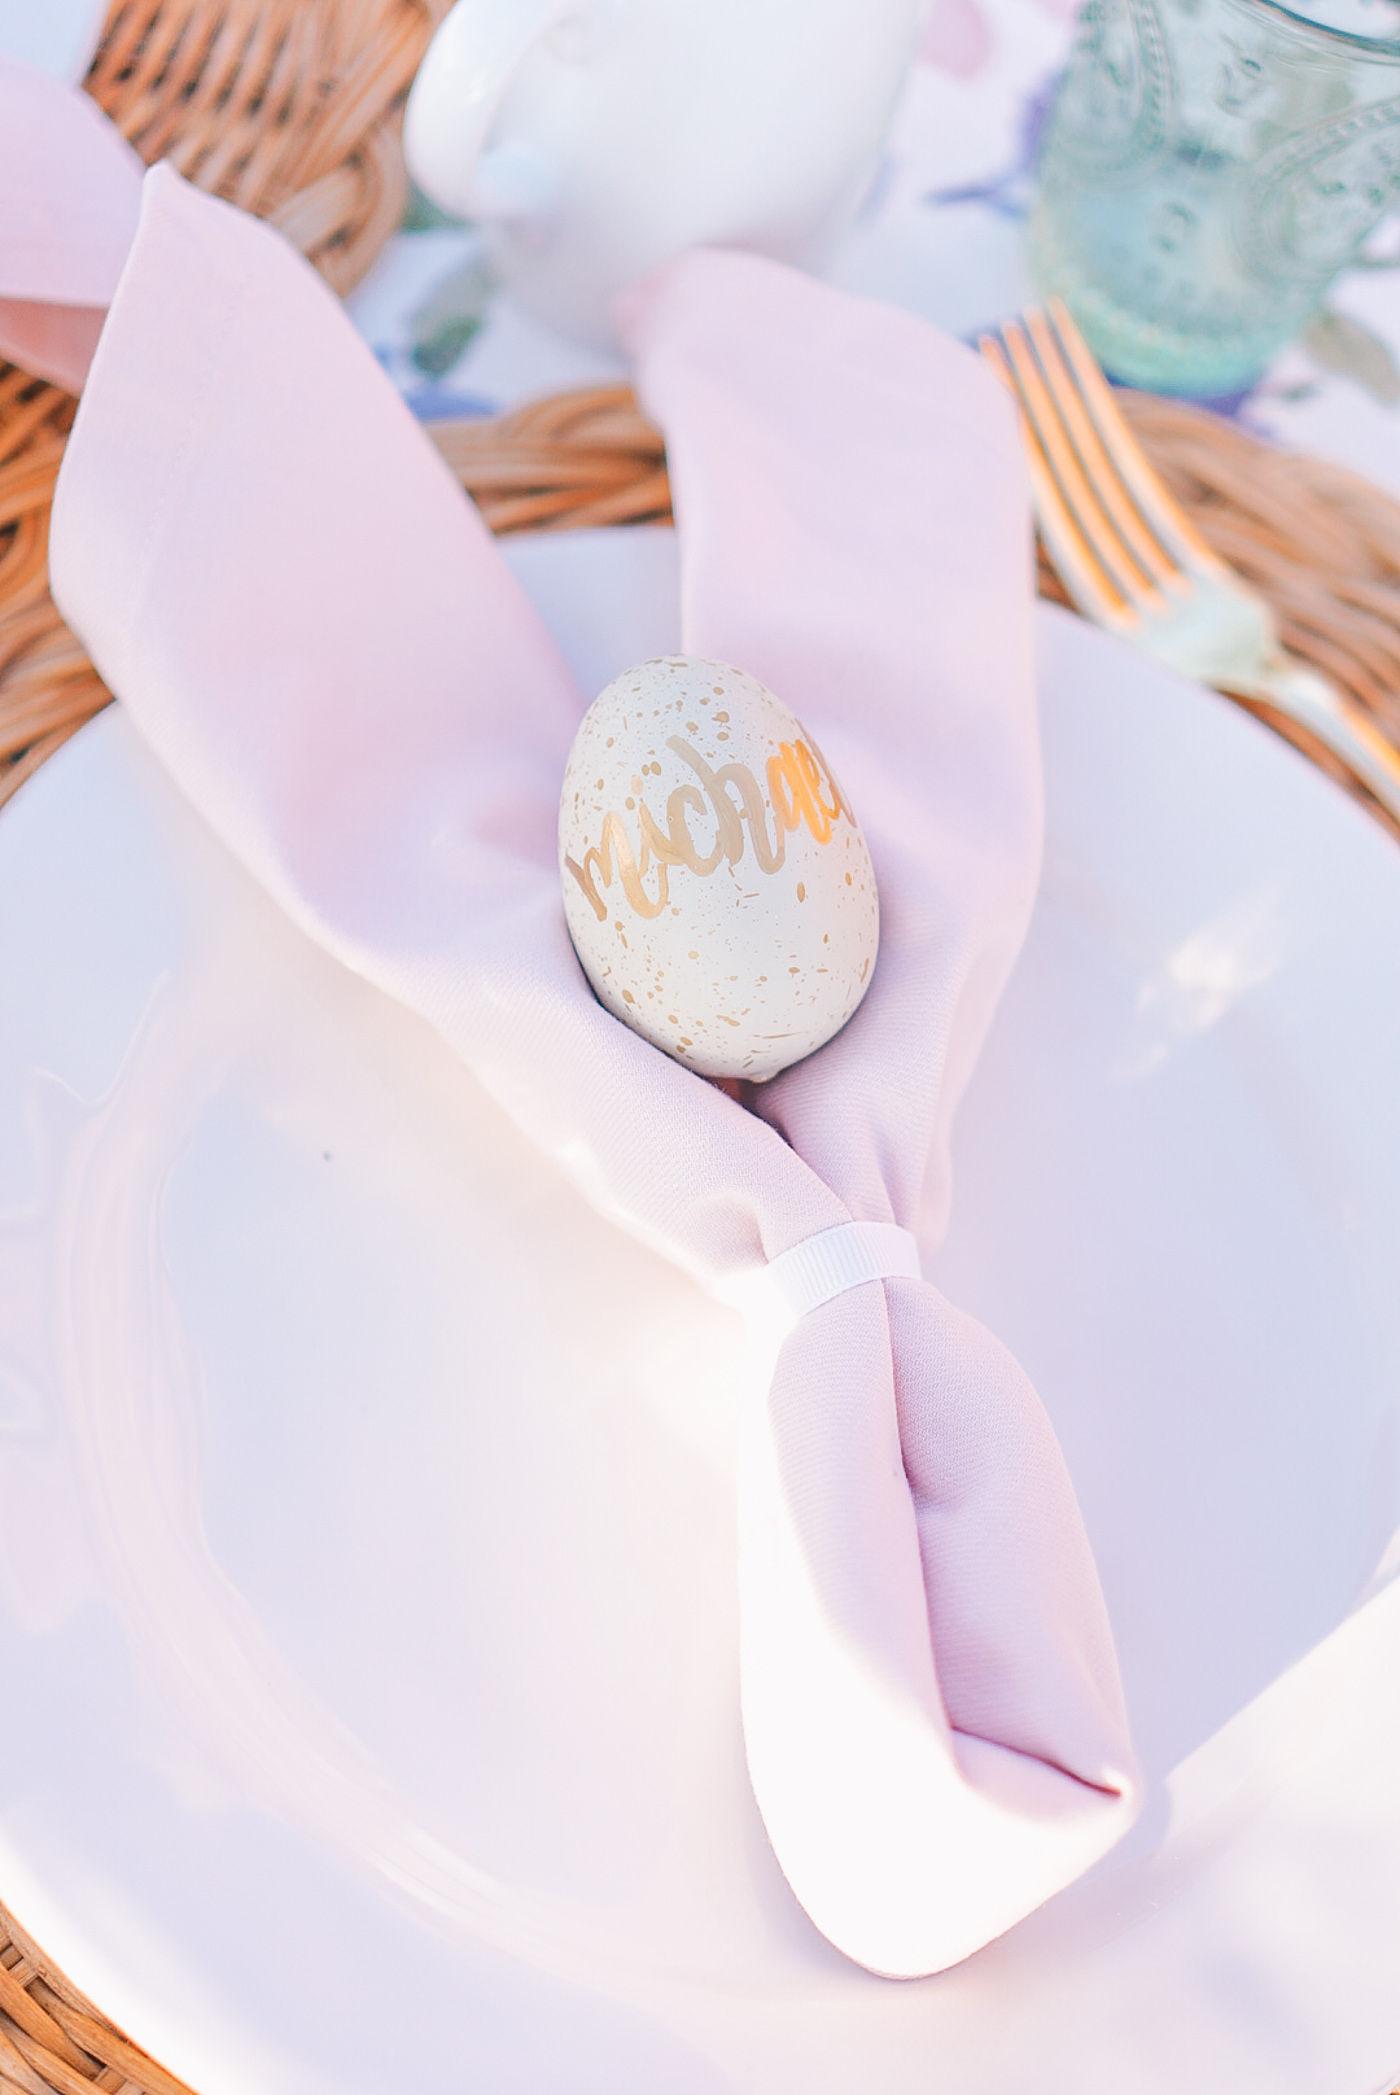 bunny-ear-napkin-for-easter